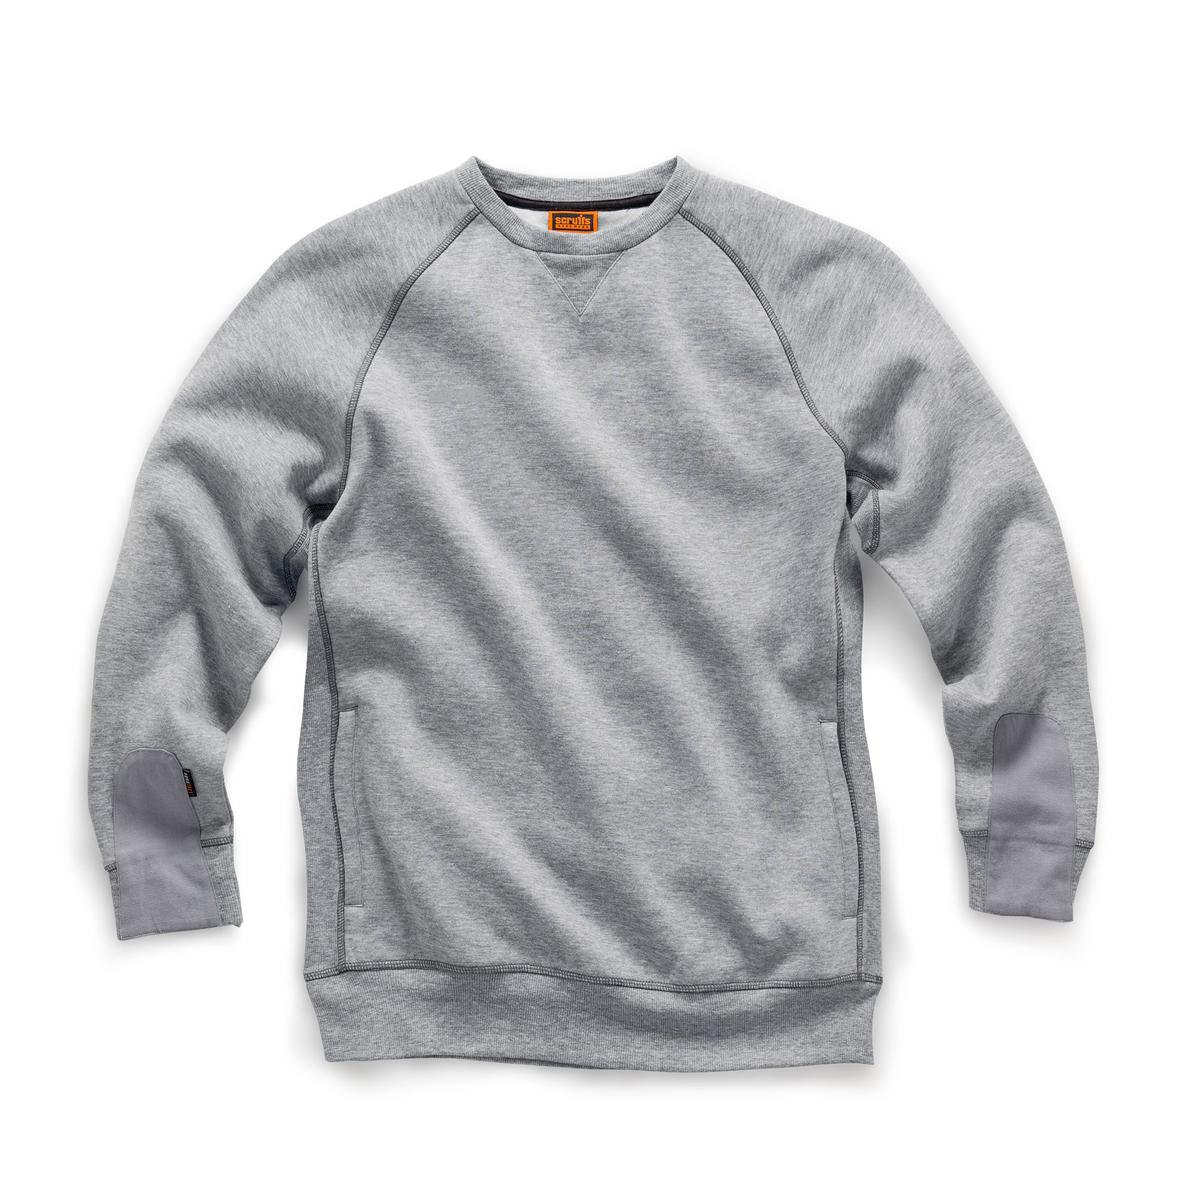 Trade Sweatshirt